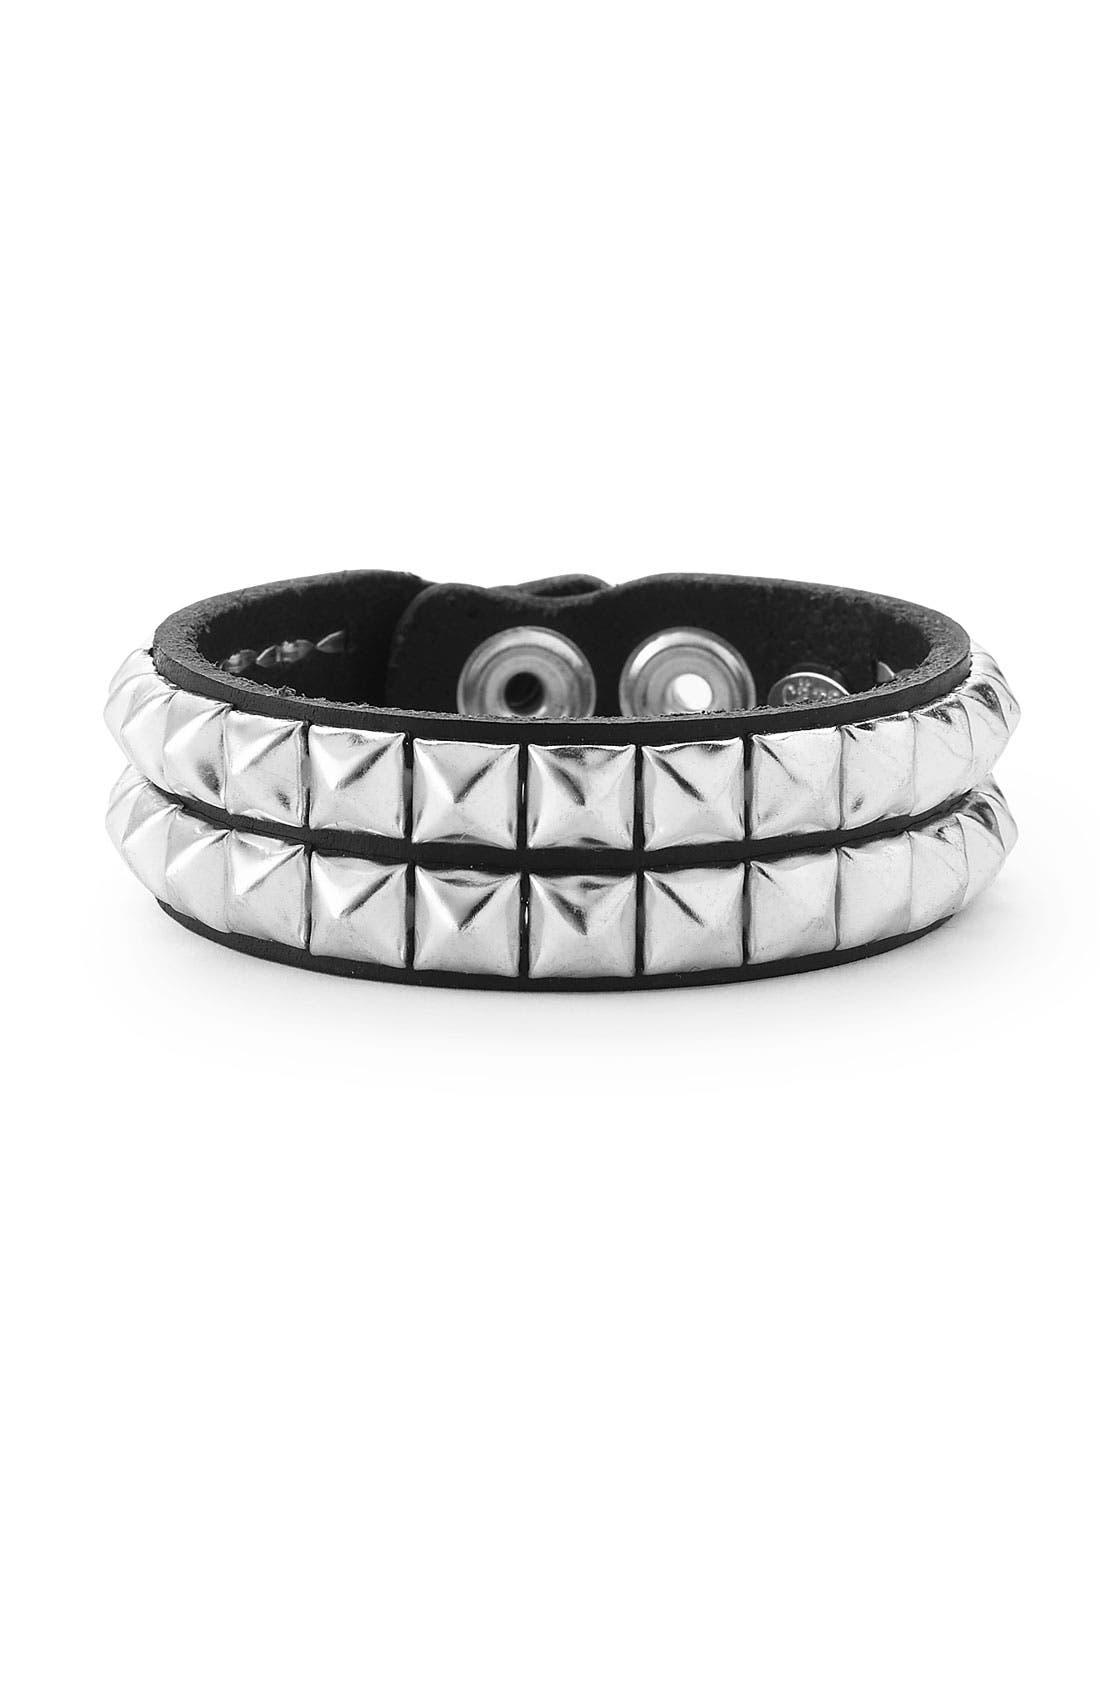 Main Image - Cara Couture Double Row Pyramid Stud Bracelet